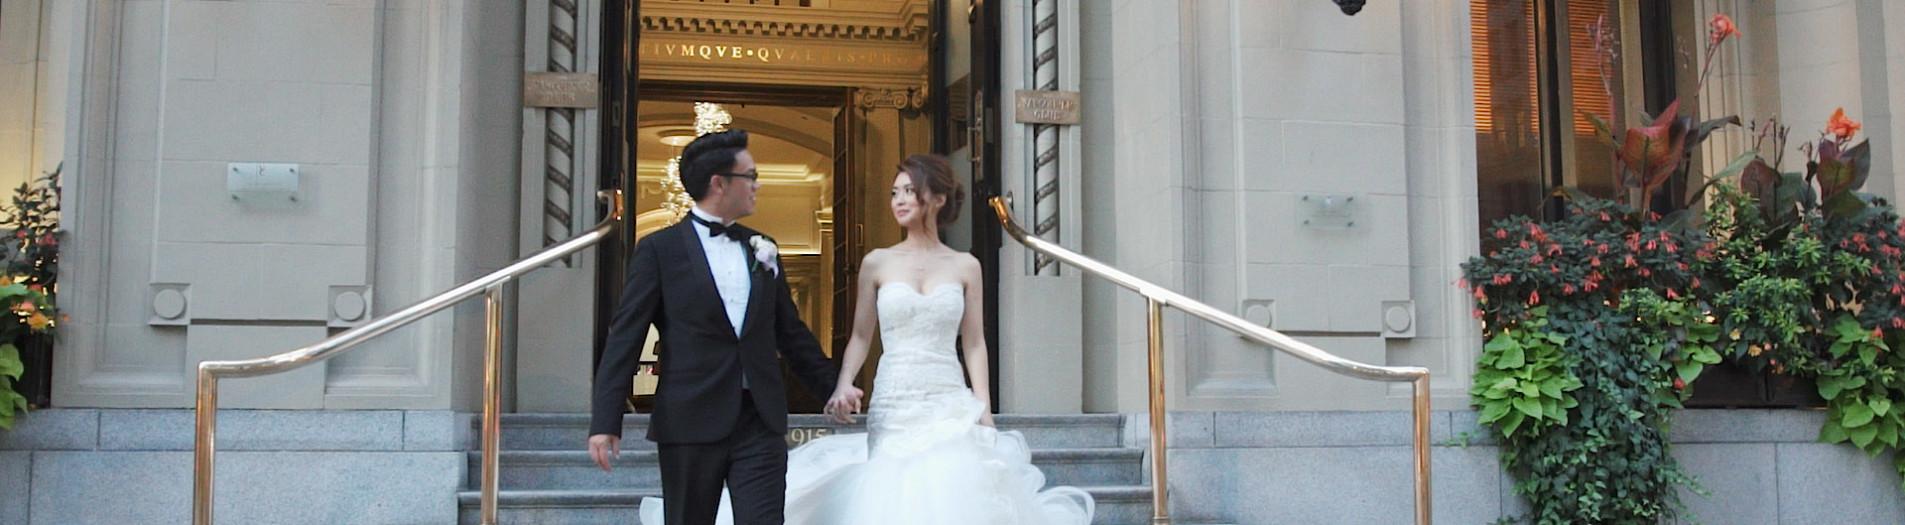 Dahye & Kevin // Wedding Highlight Film // Vancouver Club, Vancouver BC